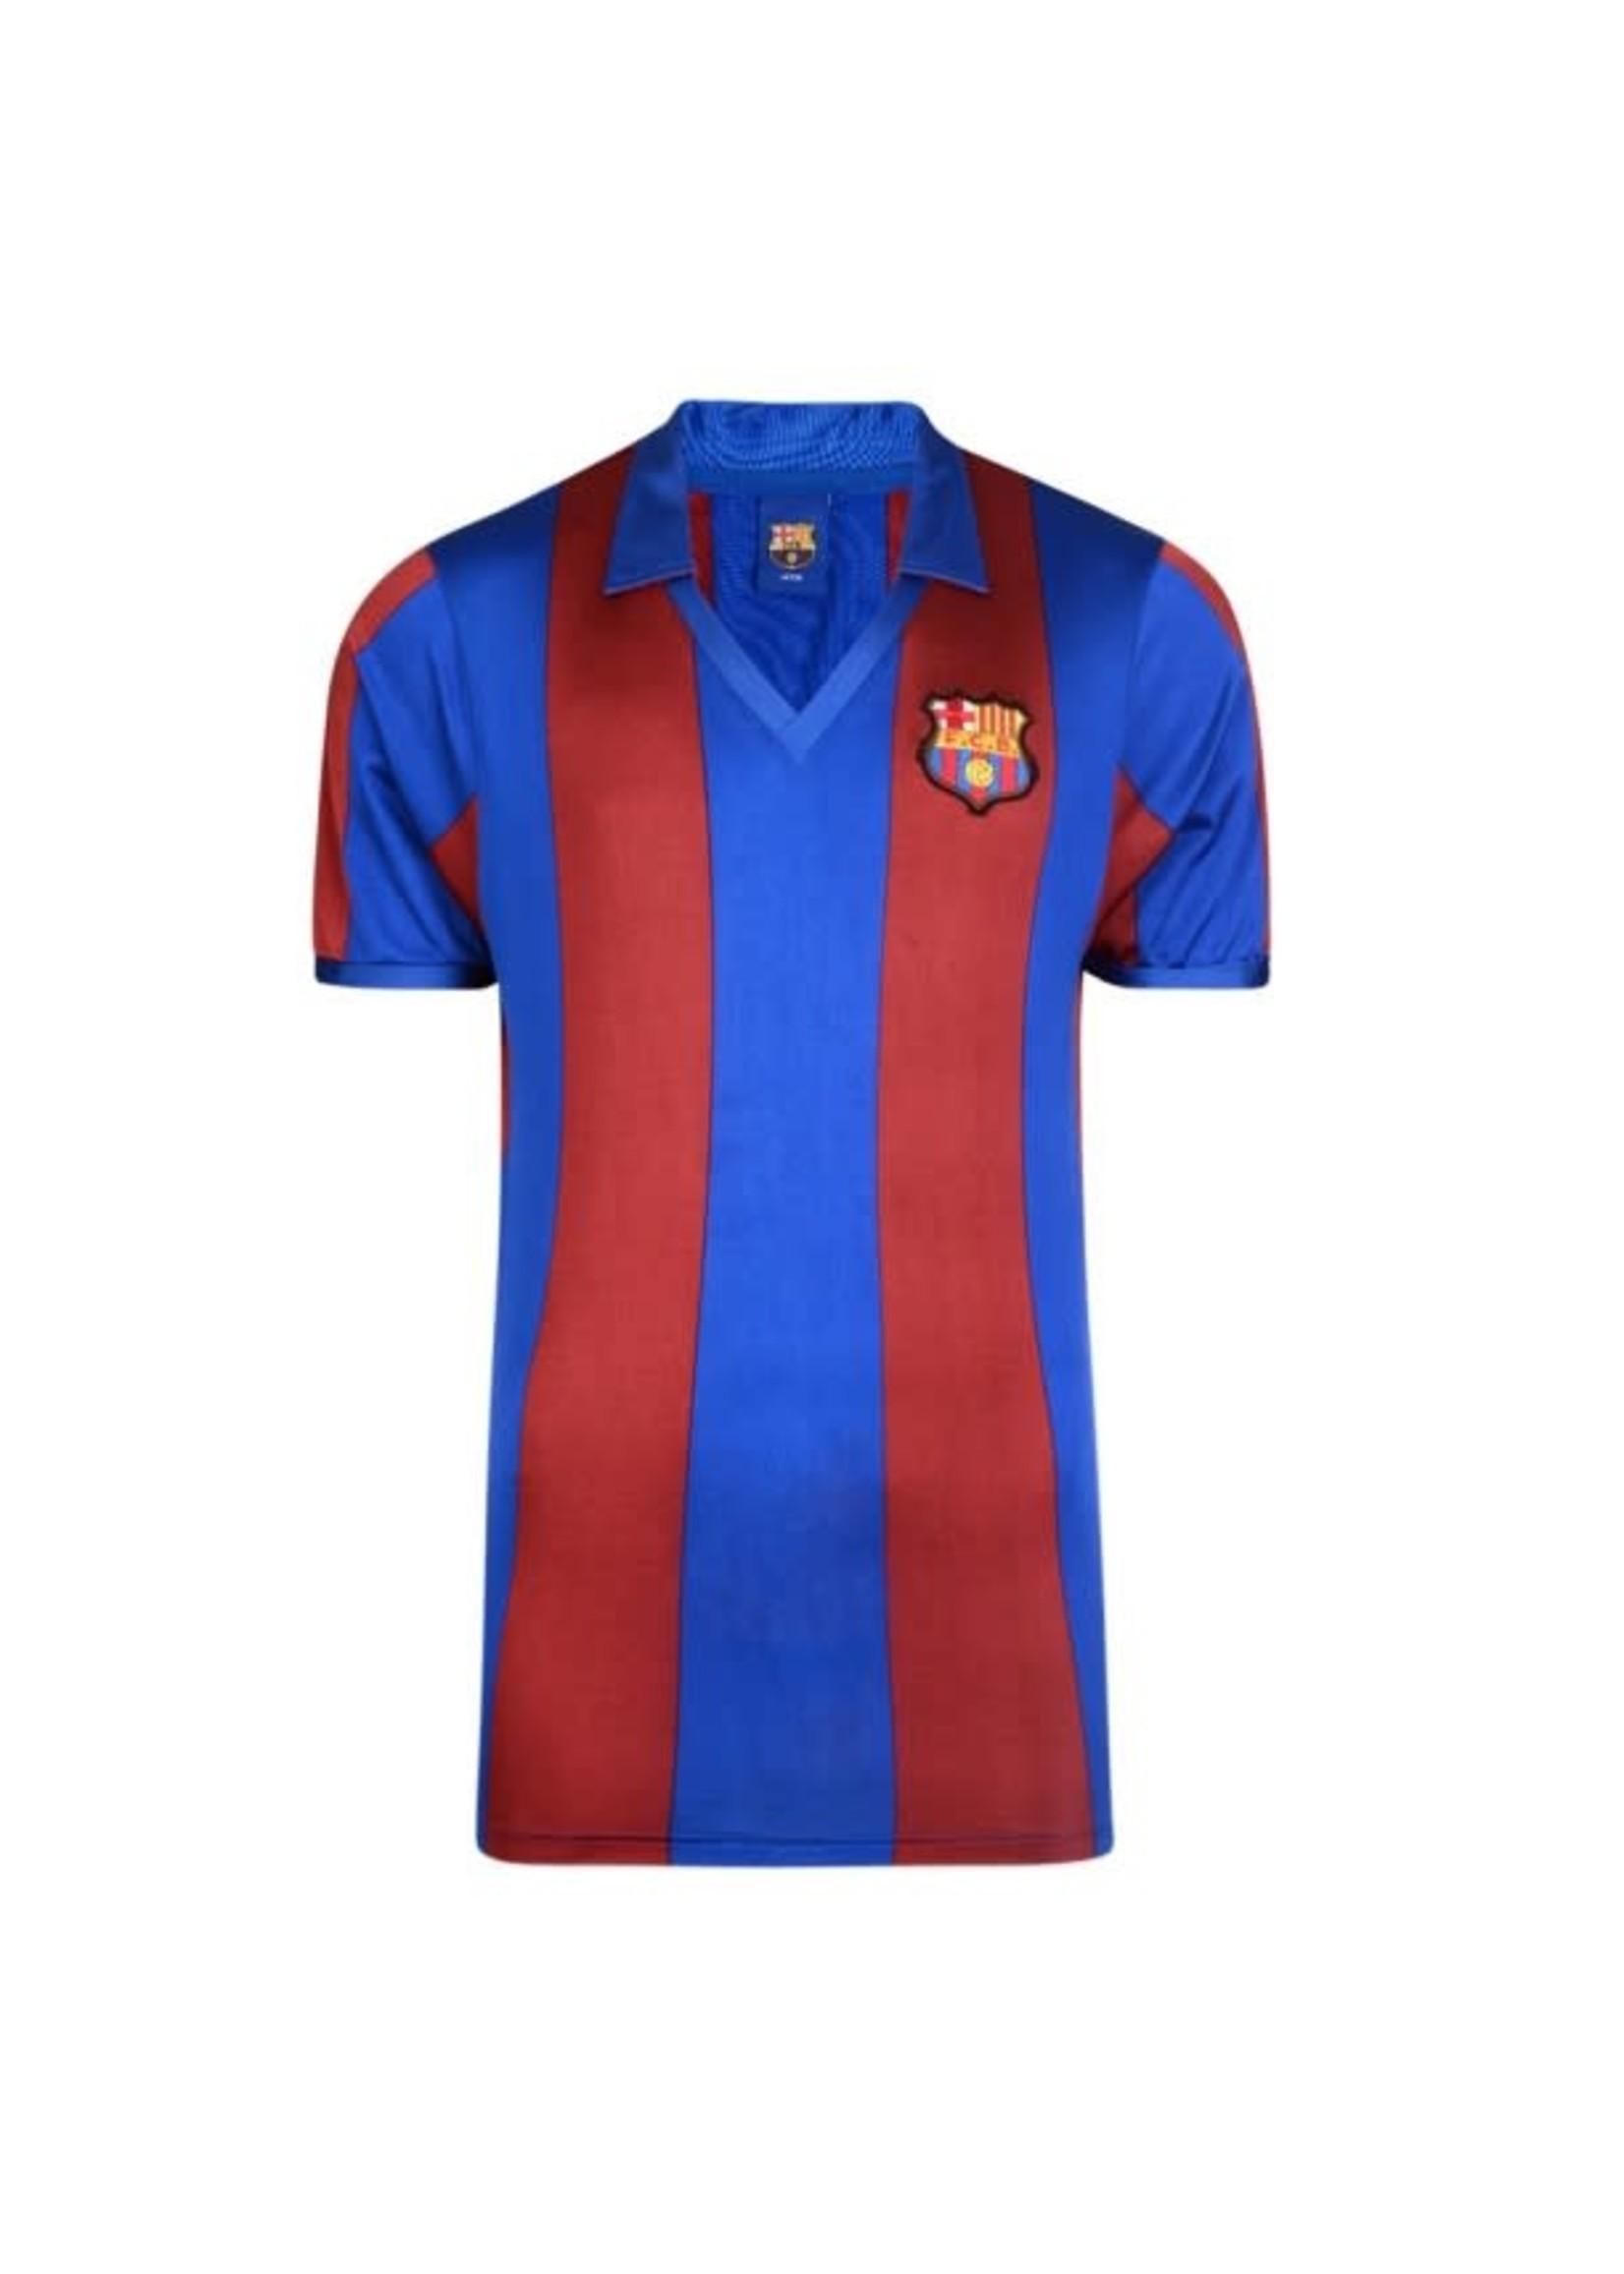 Barcelona Icon Jersey - Vintage